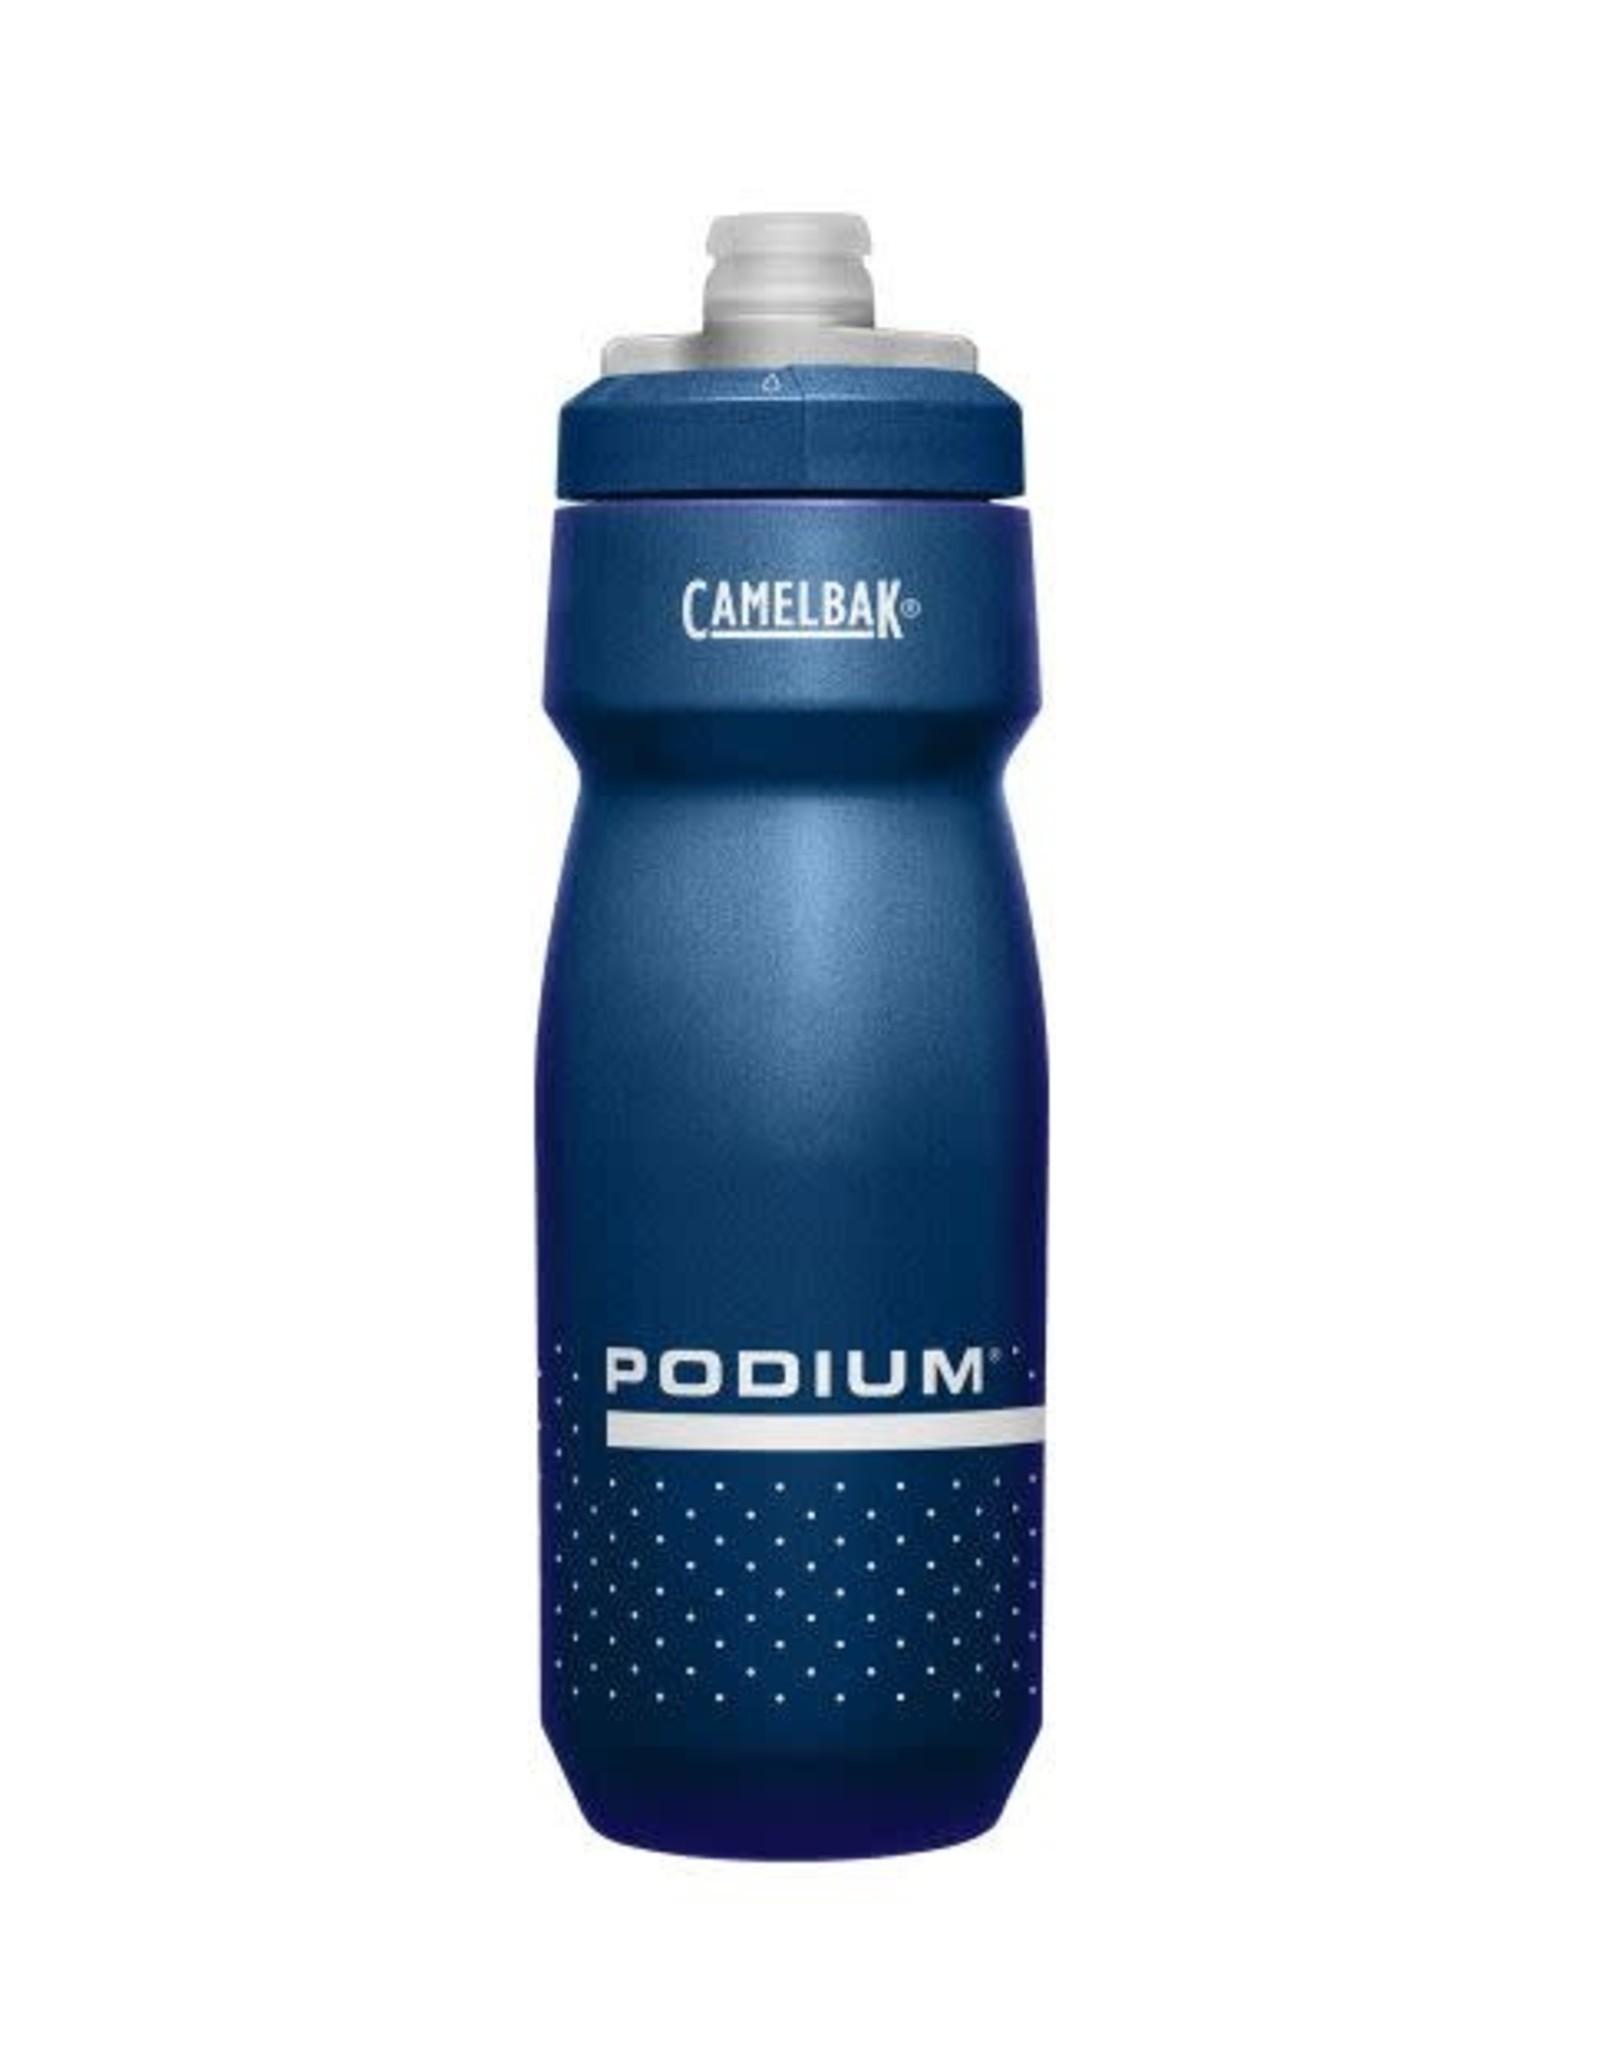 Camelbak Bottle Camelbak Podium